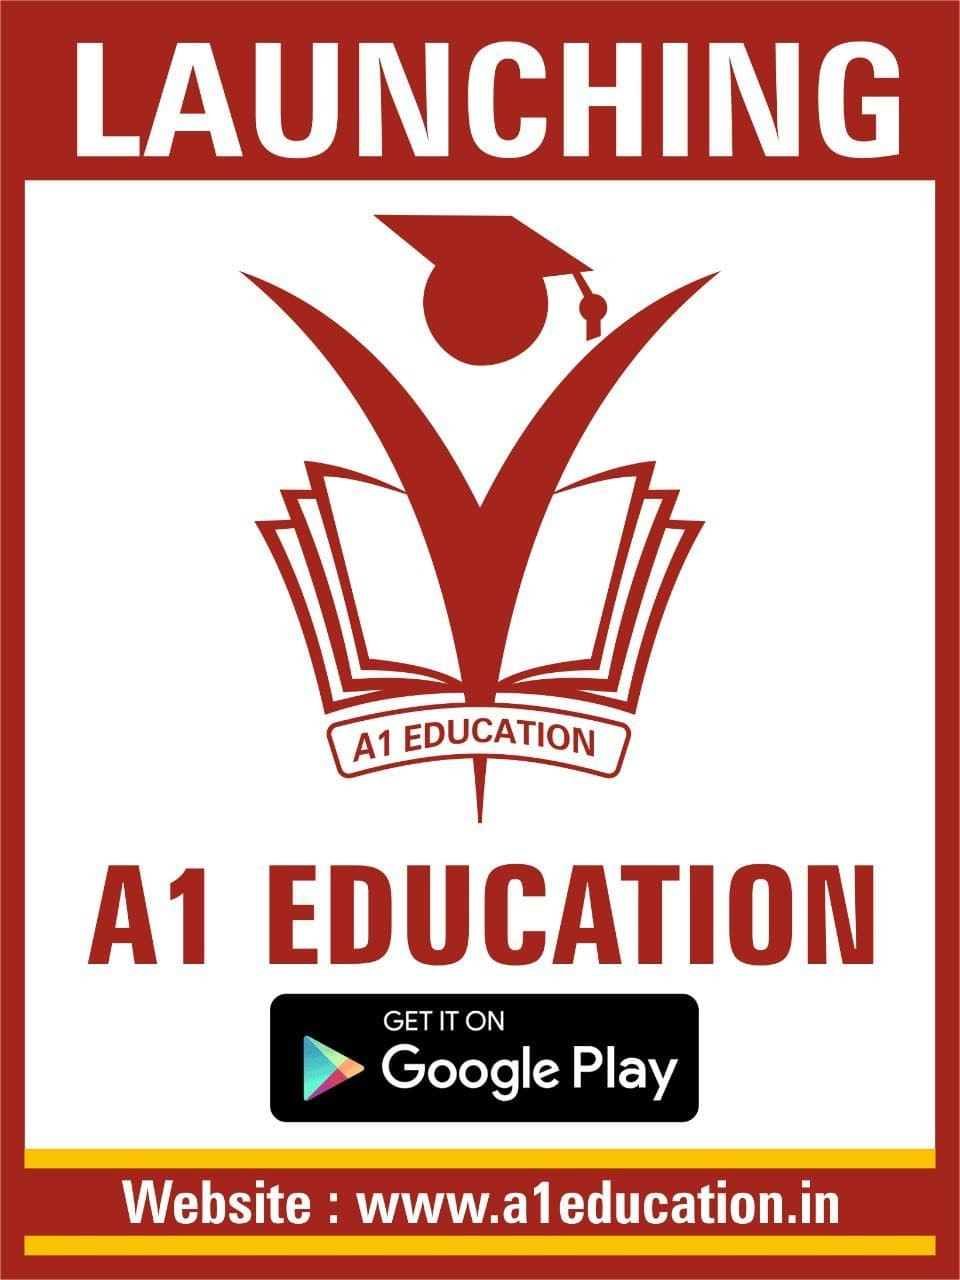 A1 Education